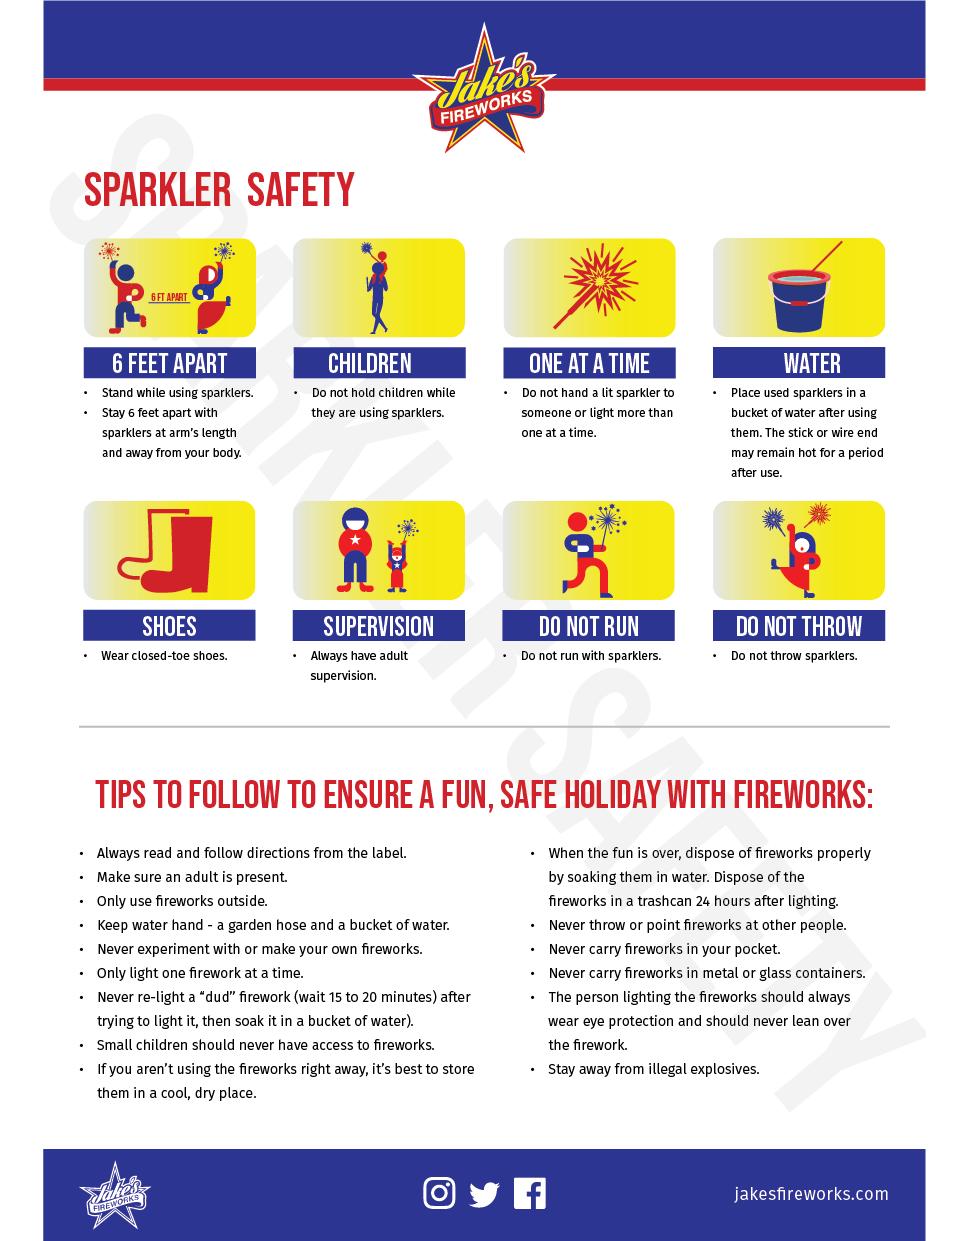 vogts_fireworks-safety-pdf2